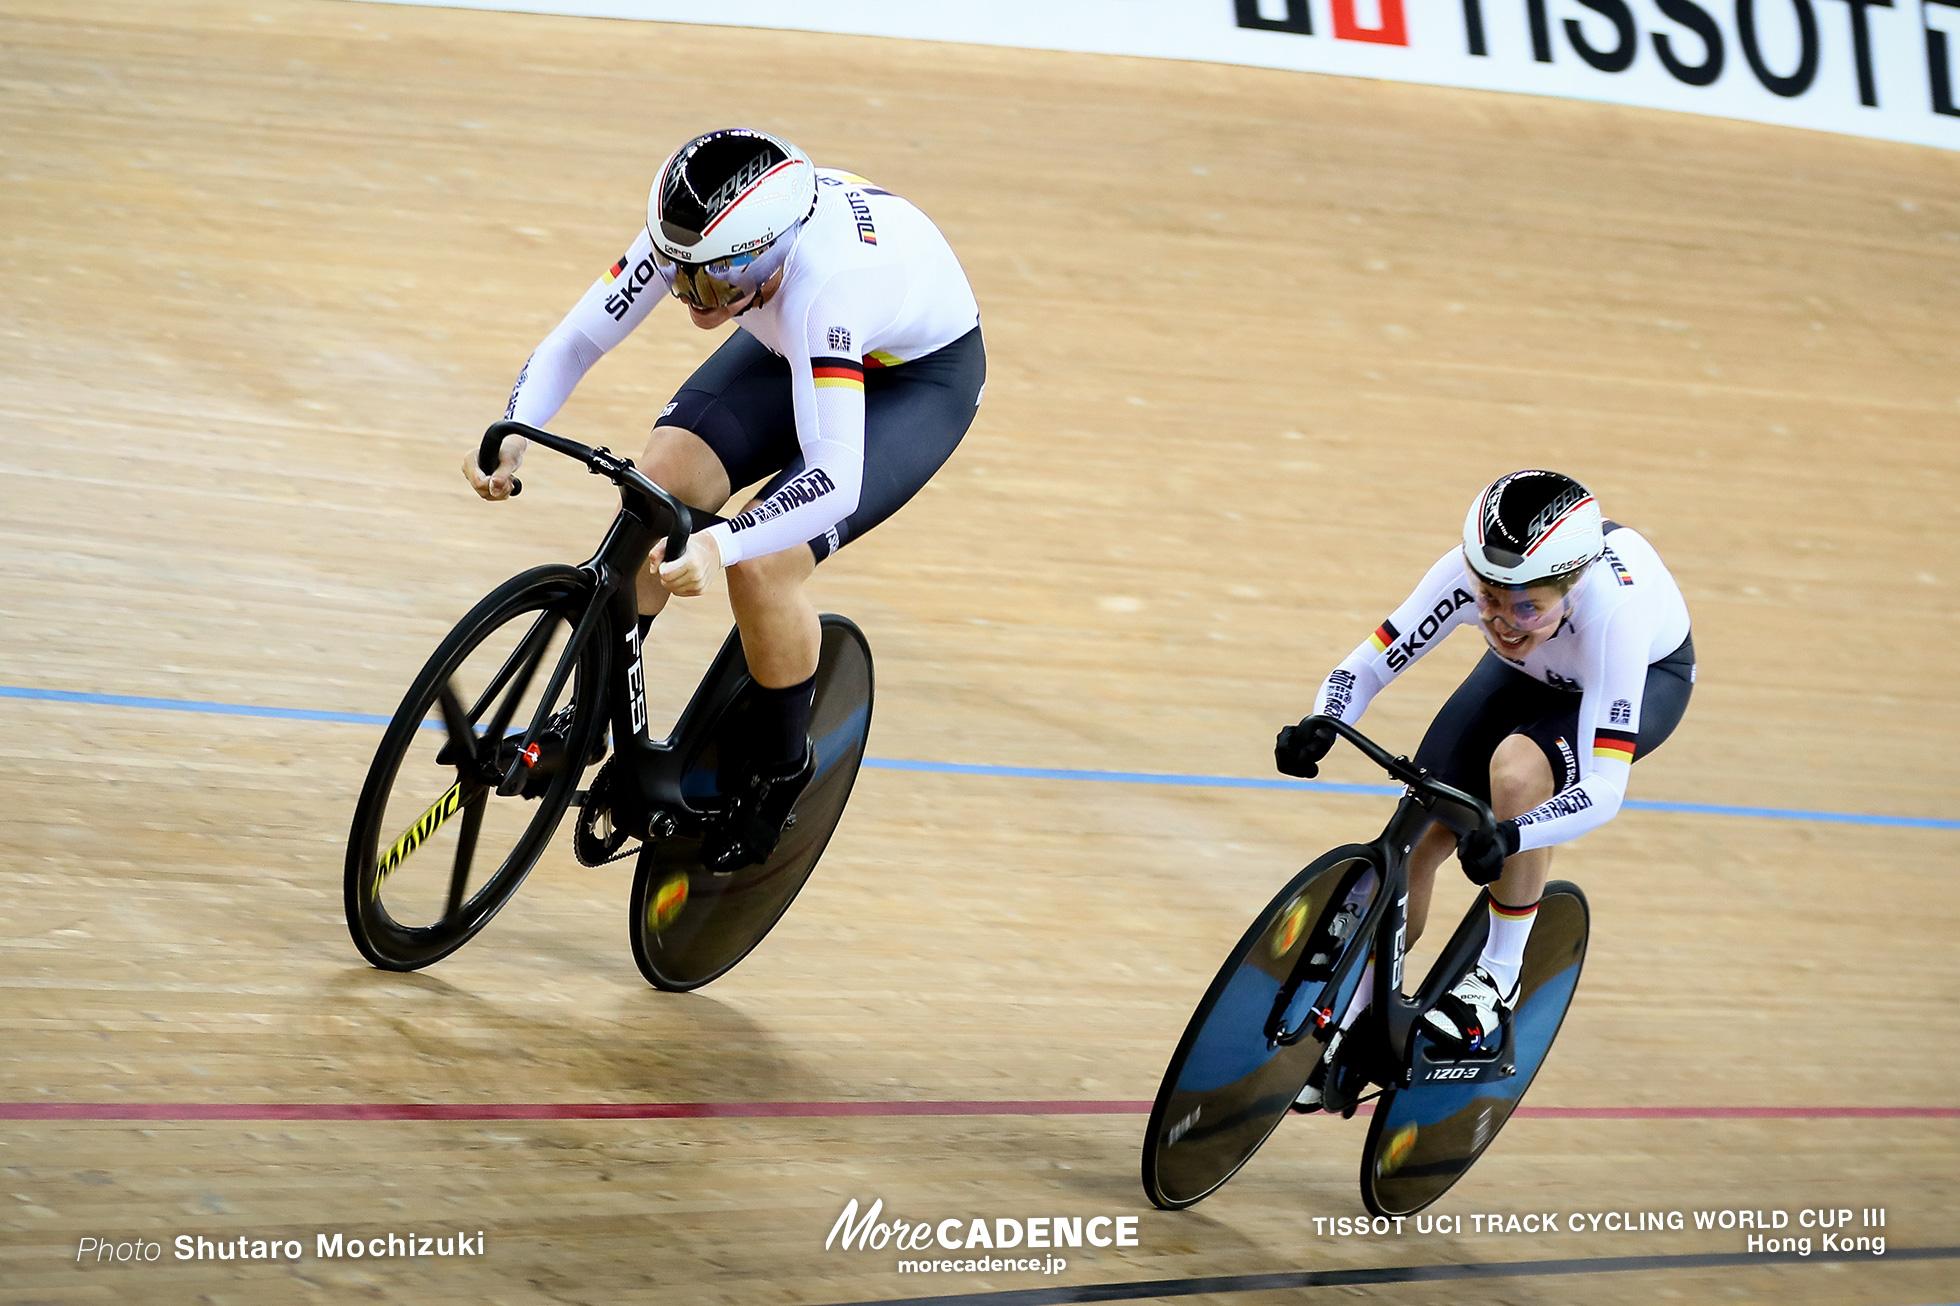 Women's Team Sprint / TISSOT UCI TRACK CYCLING WORLD CUP III, Hong Kong